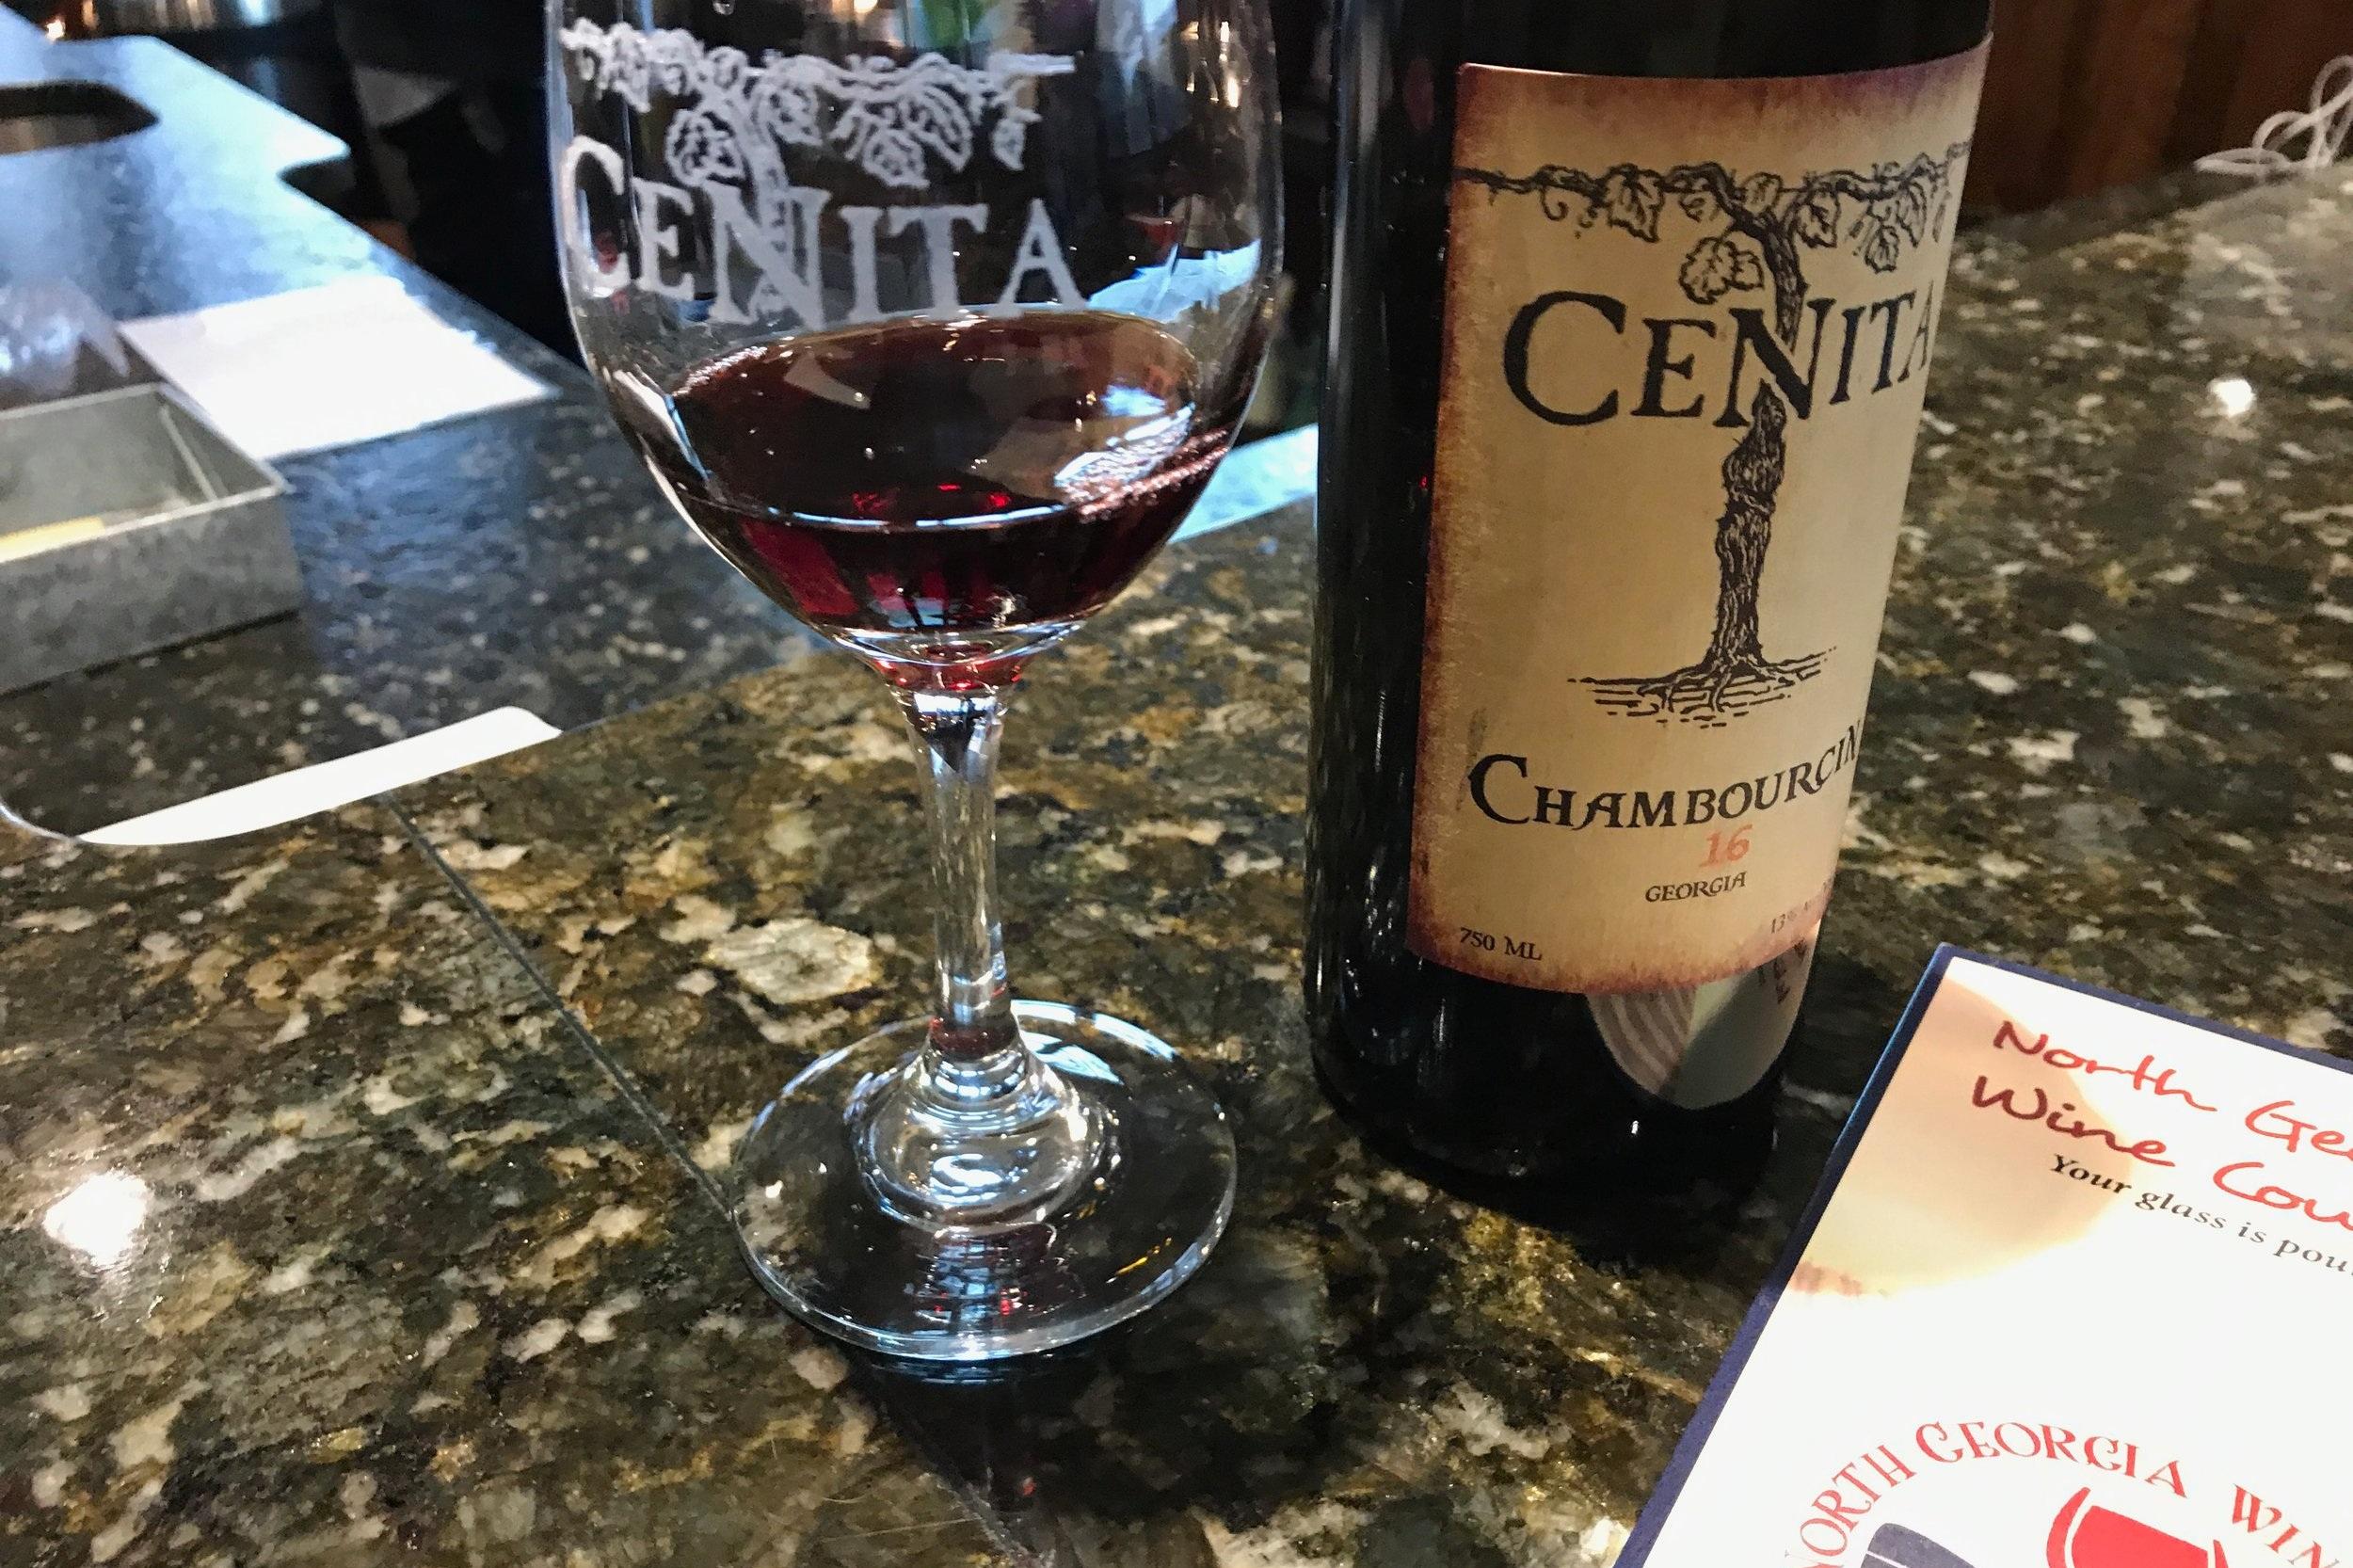 CeNita Vineyards